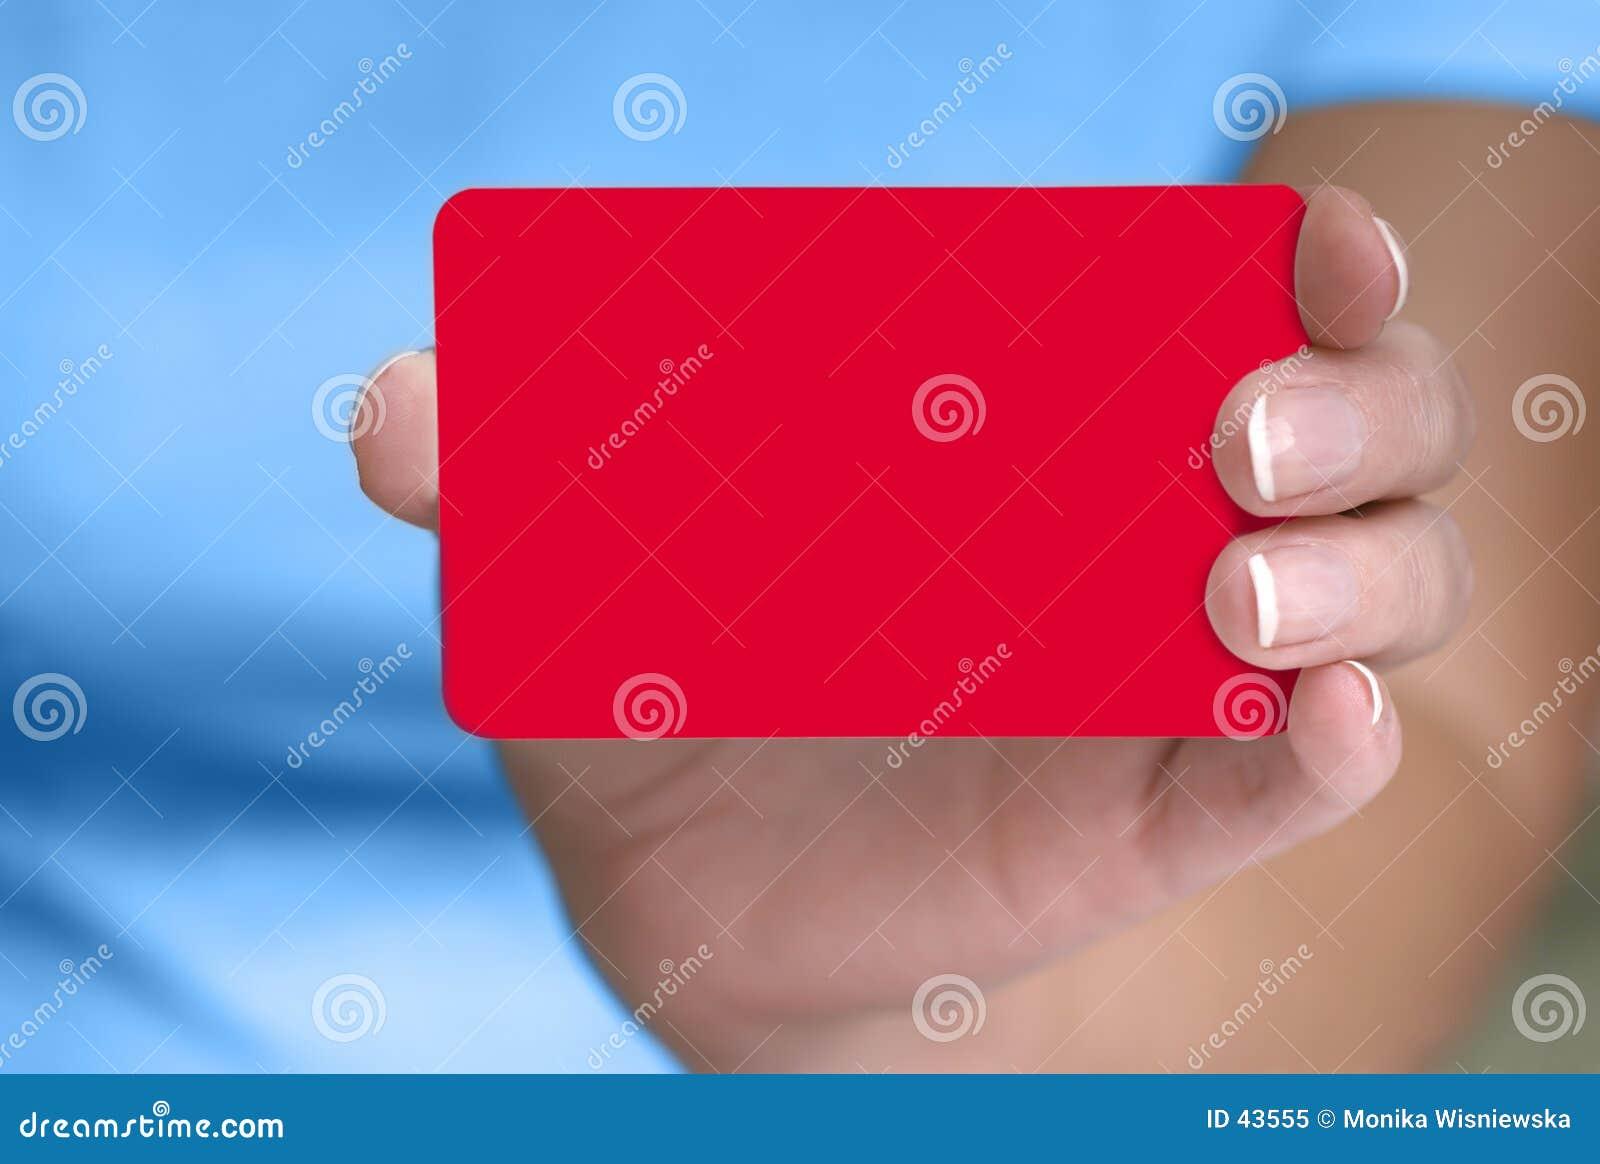 Download Mano Que Muestra La Tarjeta En Blanco Imagen de archivo - Imagen de tarjeta, azul: 43555